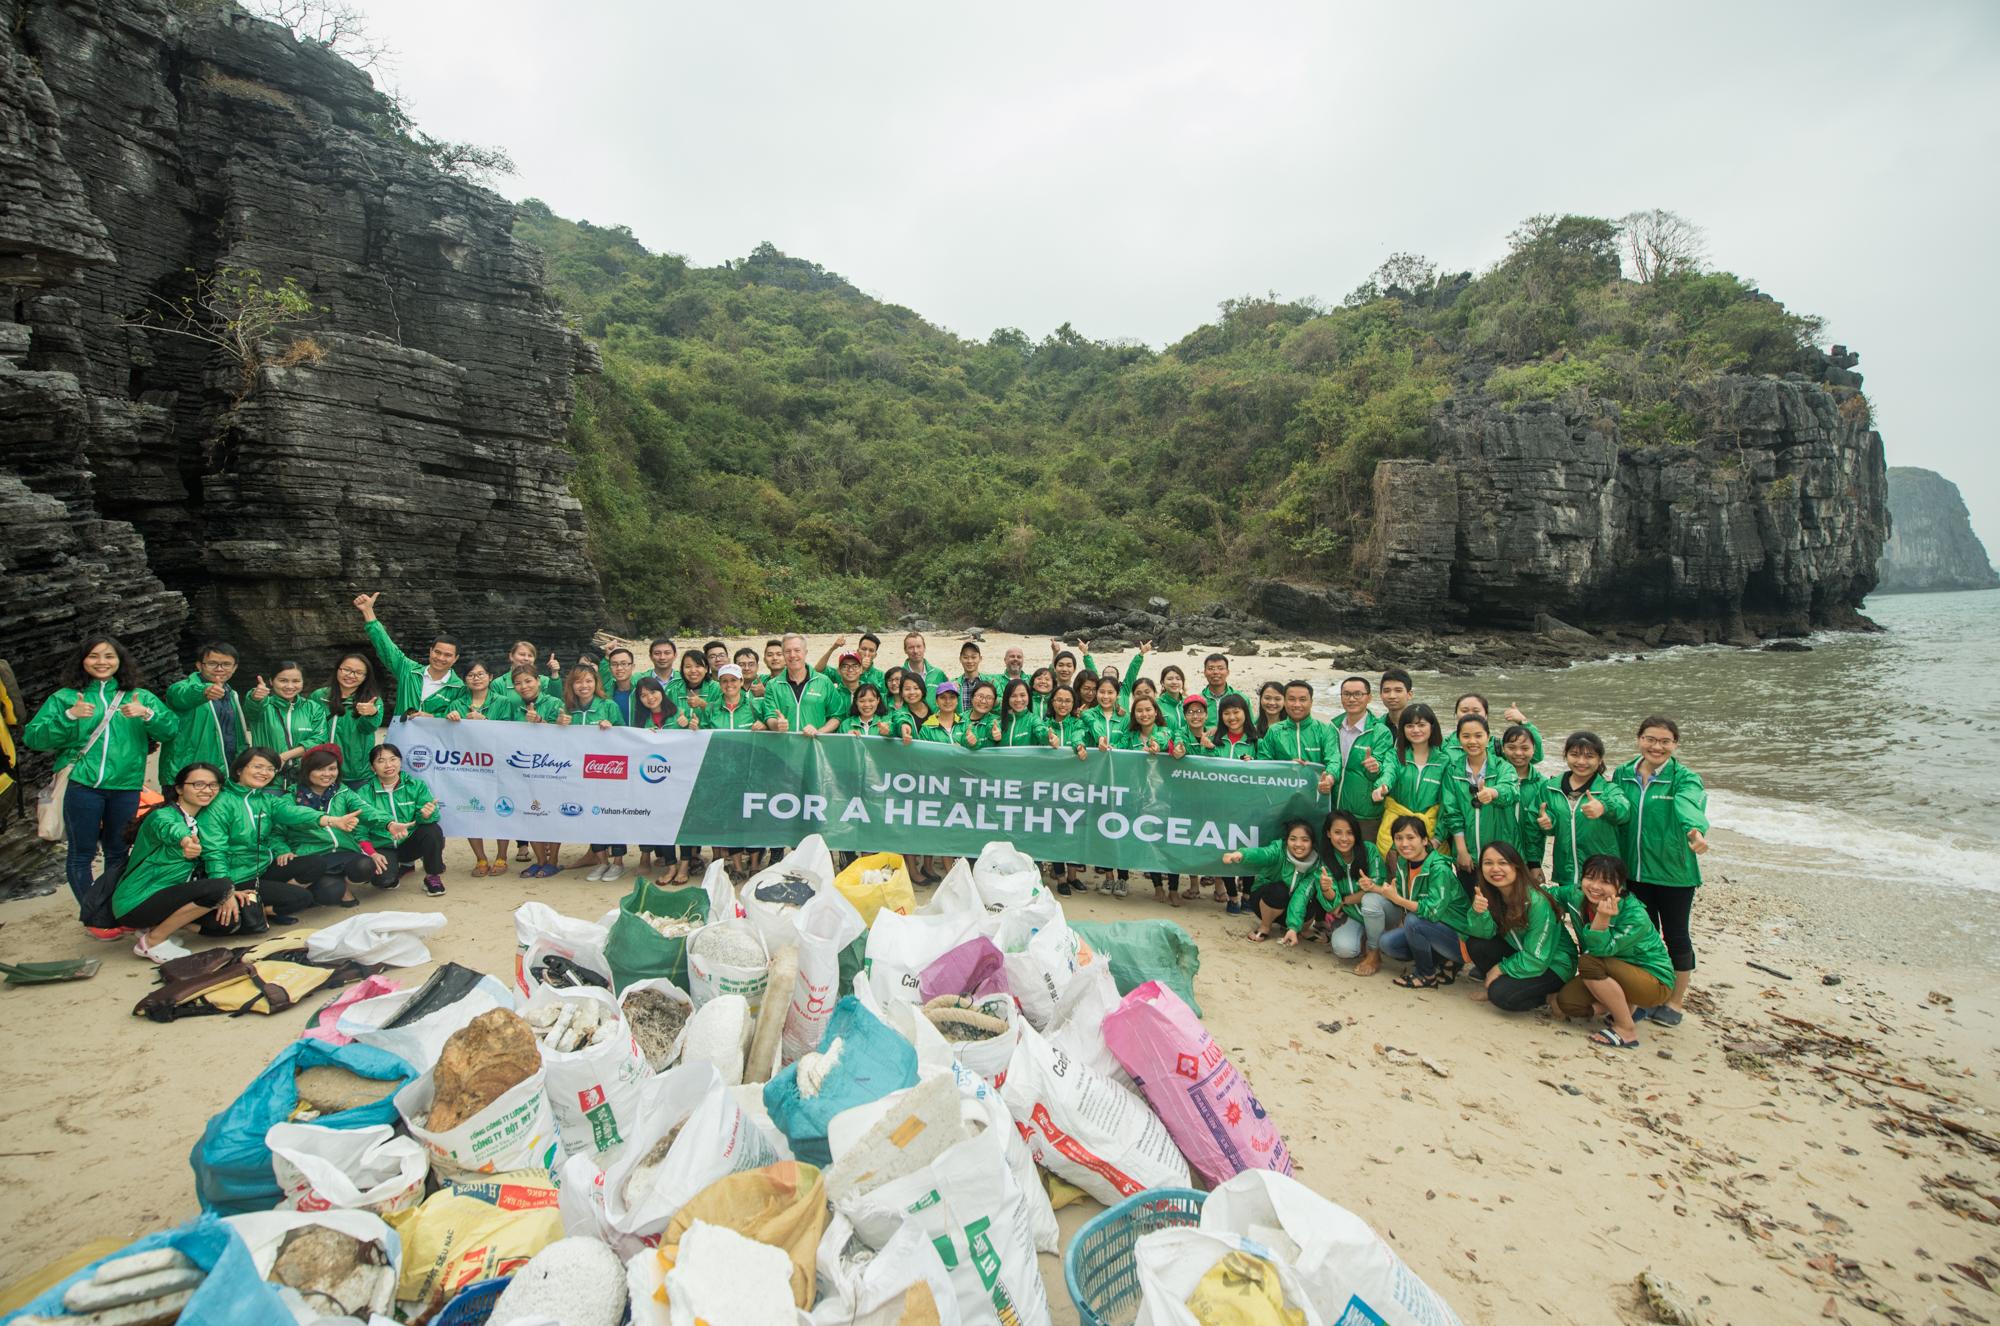 Beach_Clean-up_Day_in_Ha_Long_Bay_(32222222616).jpg